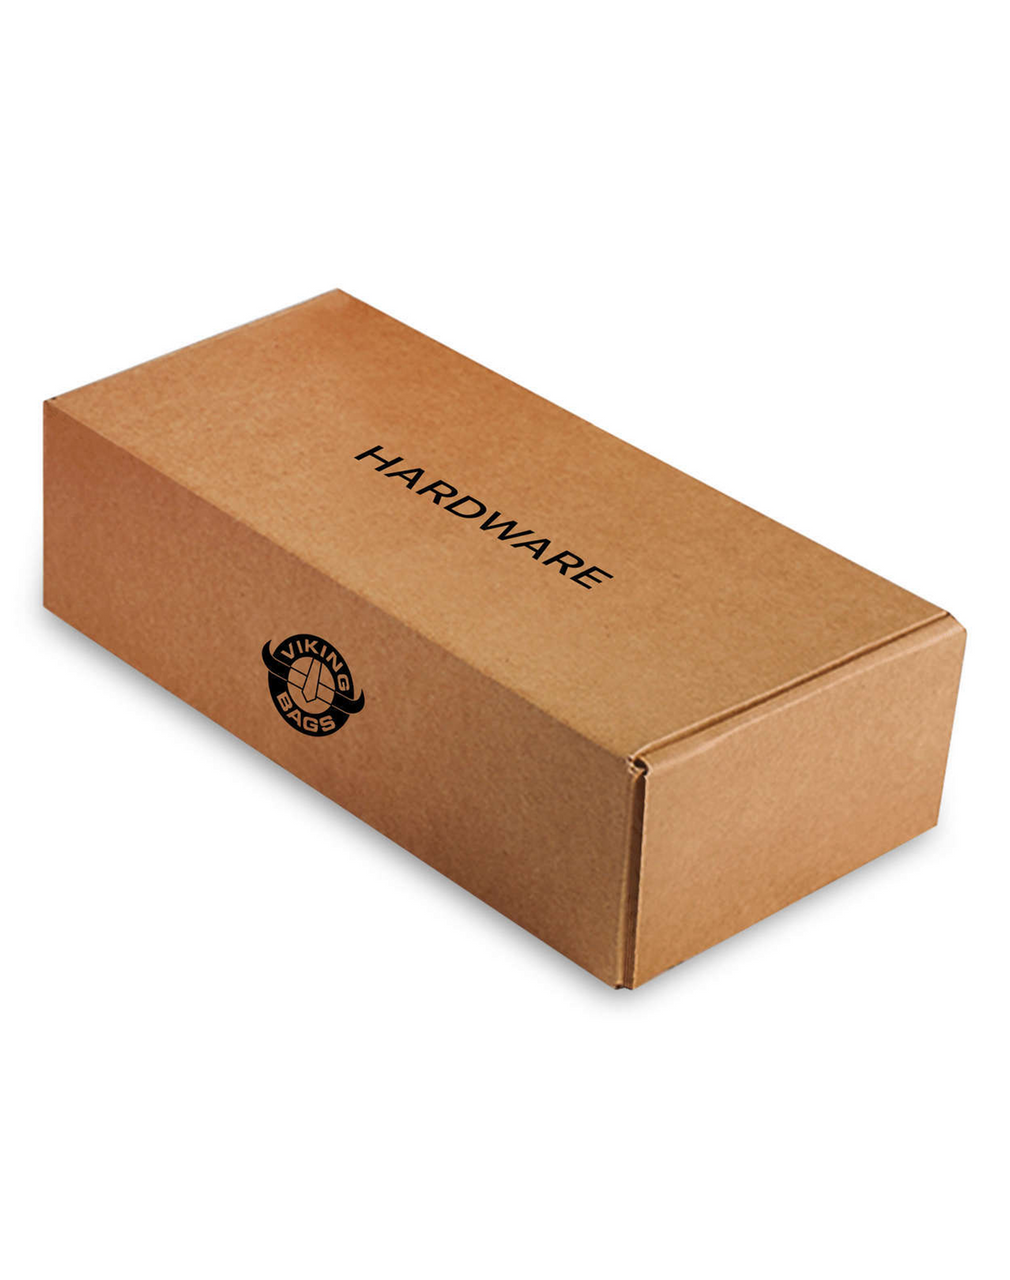 indian-scout-sixty-pinnacle-motorcycle-saddlebags Hardware Box